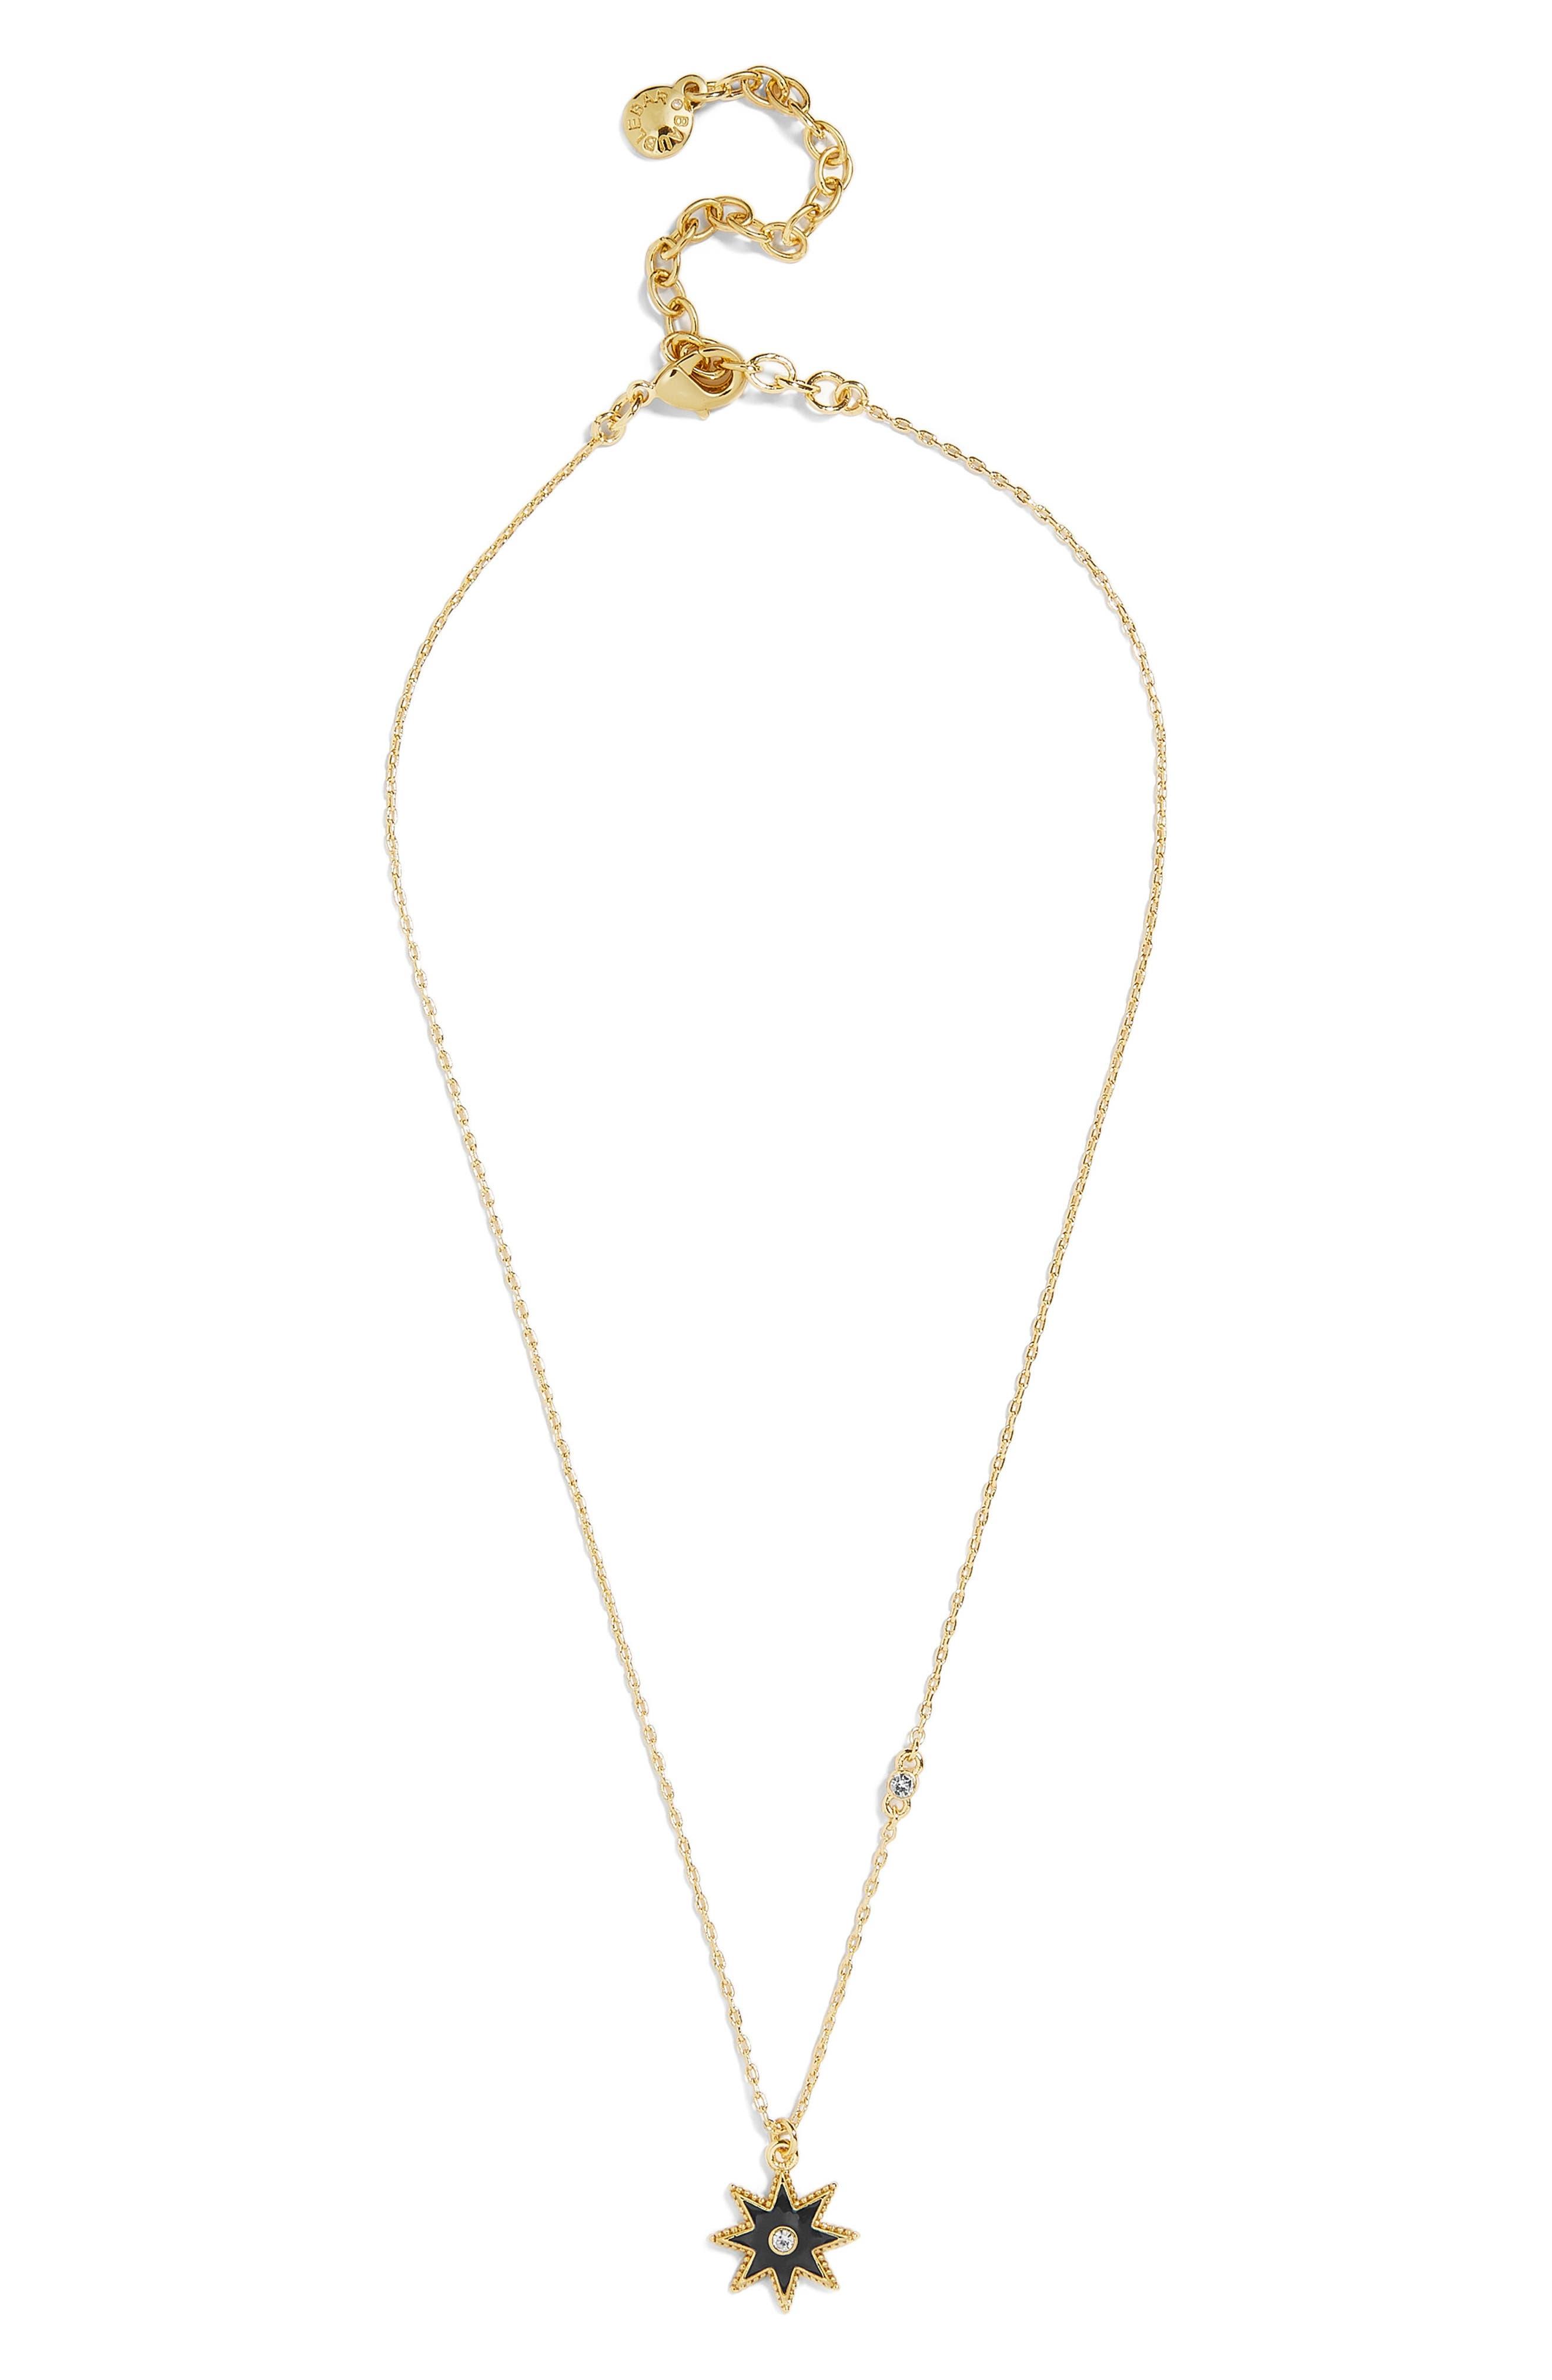 BAUBLEBAR Merralina Star Pendant Necklace, Main, color, 710